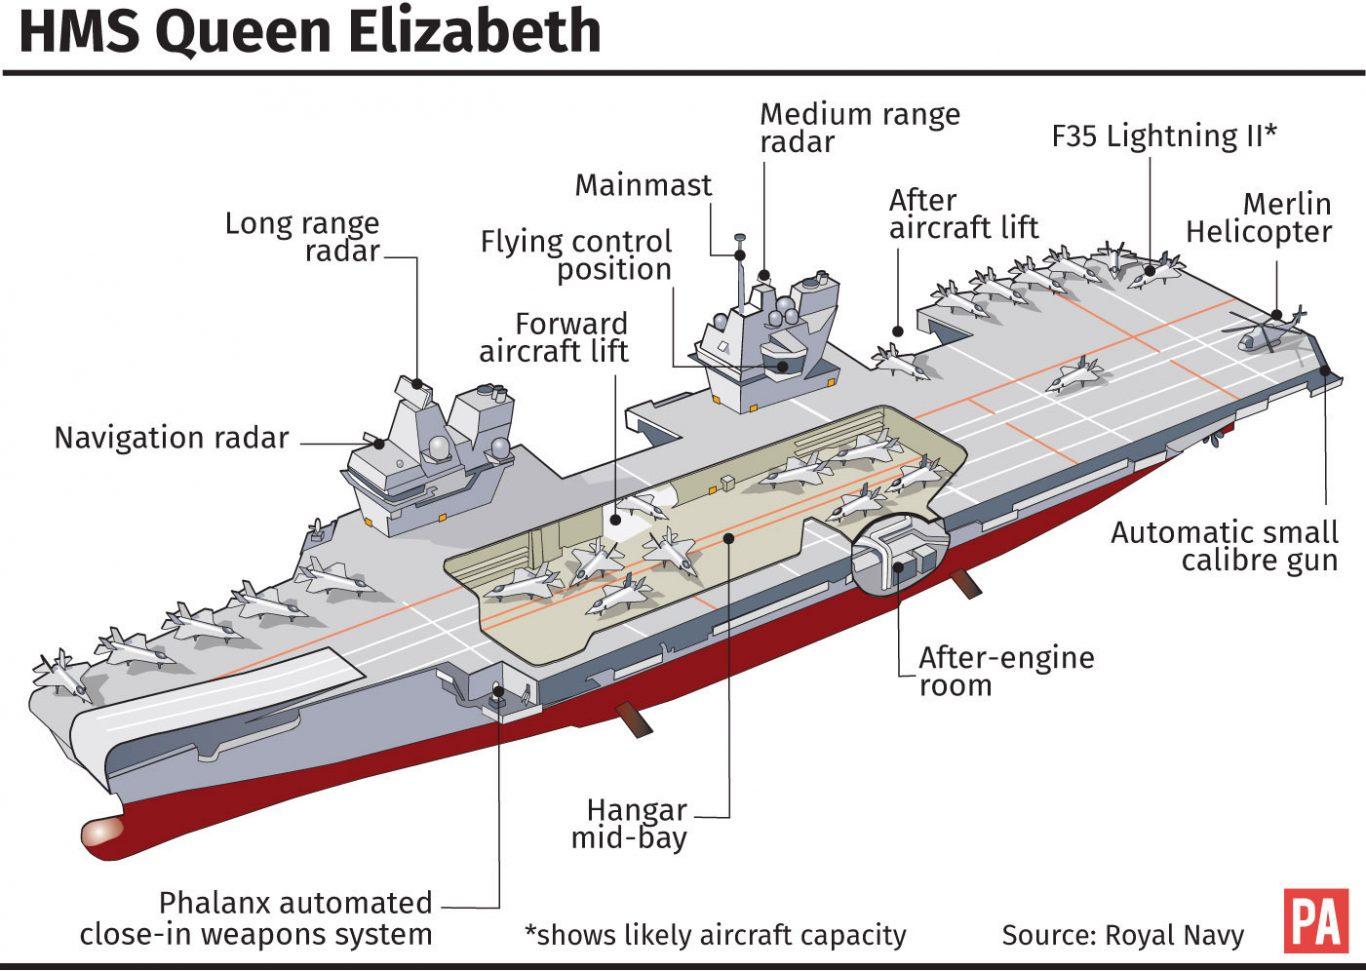 Cutaway drawing of HMS Queen Elizabeth